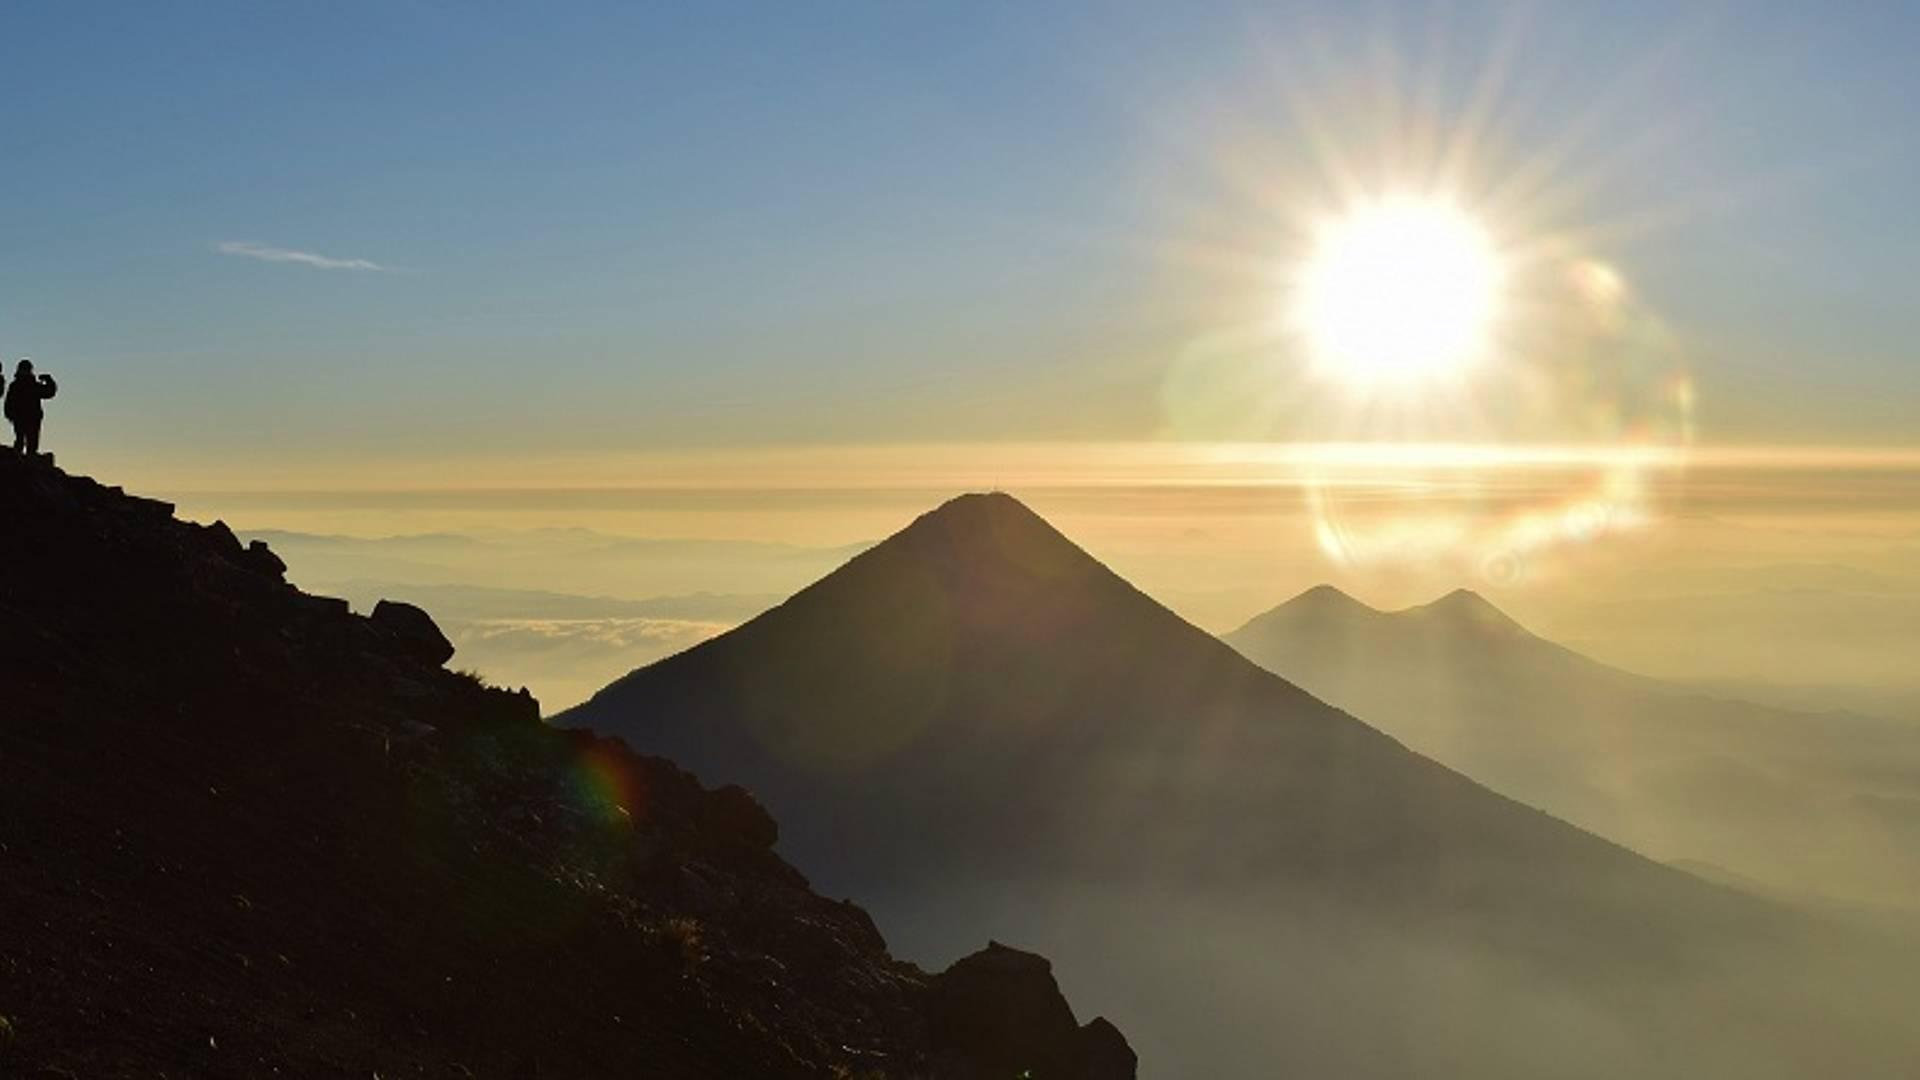 Ascension du volcan Acatenango et traditions mayas